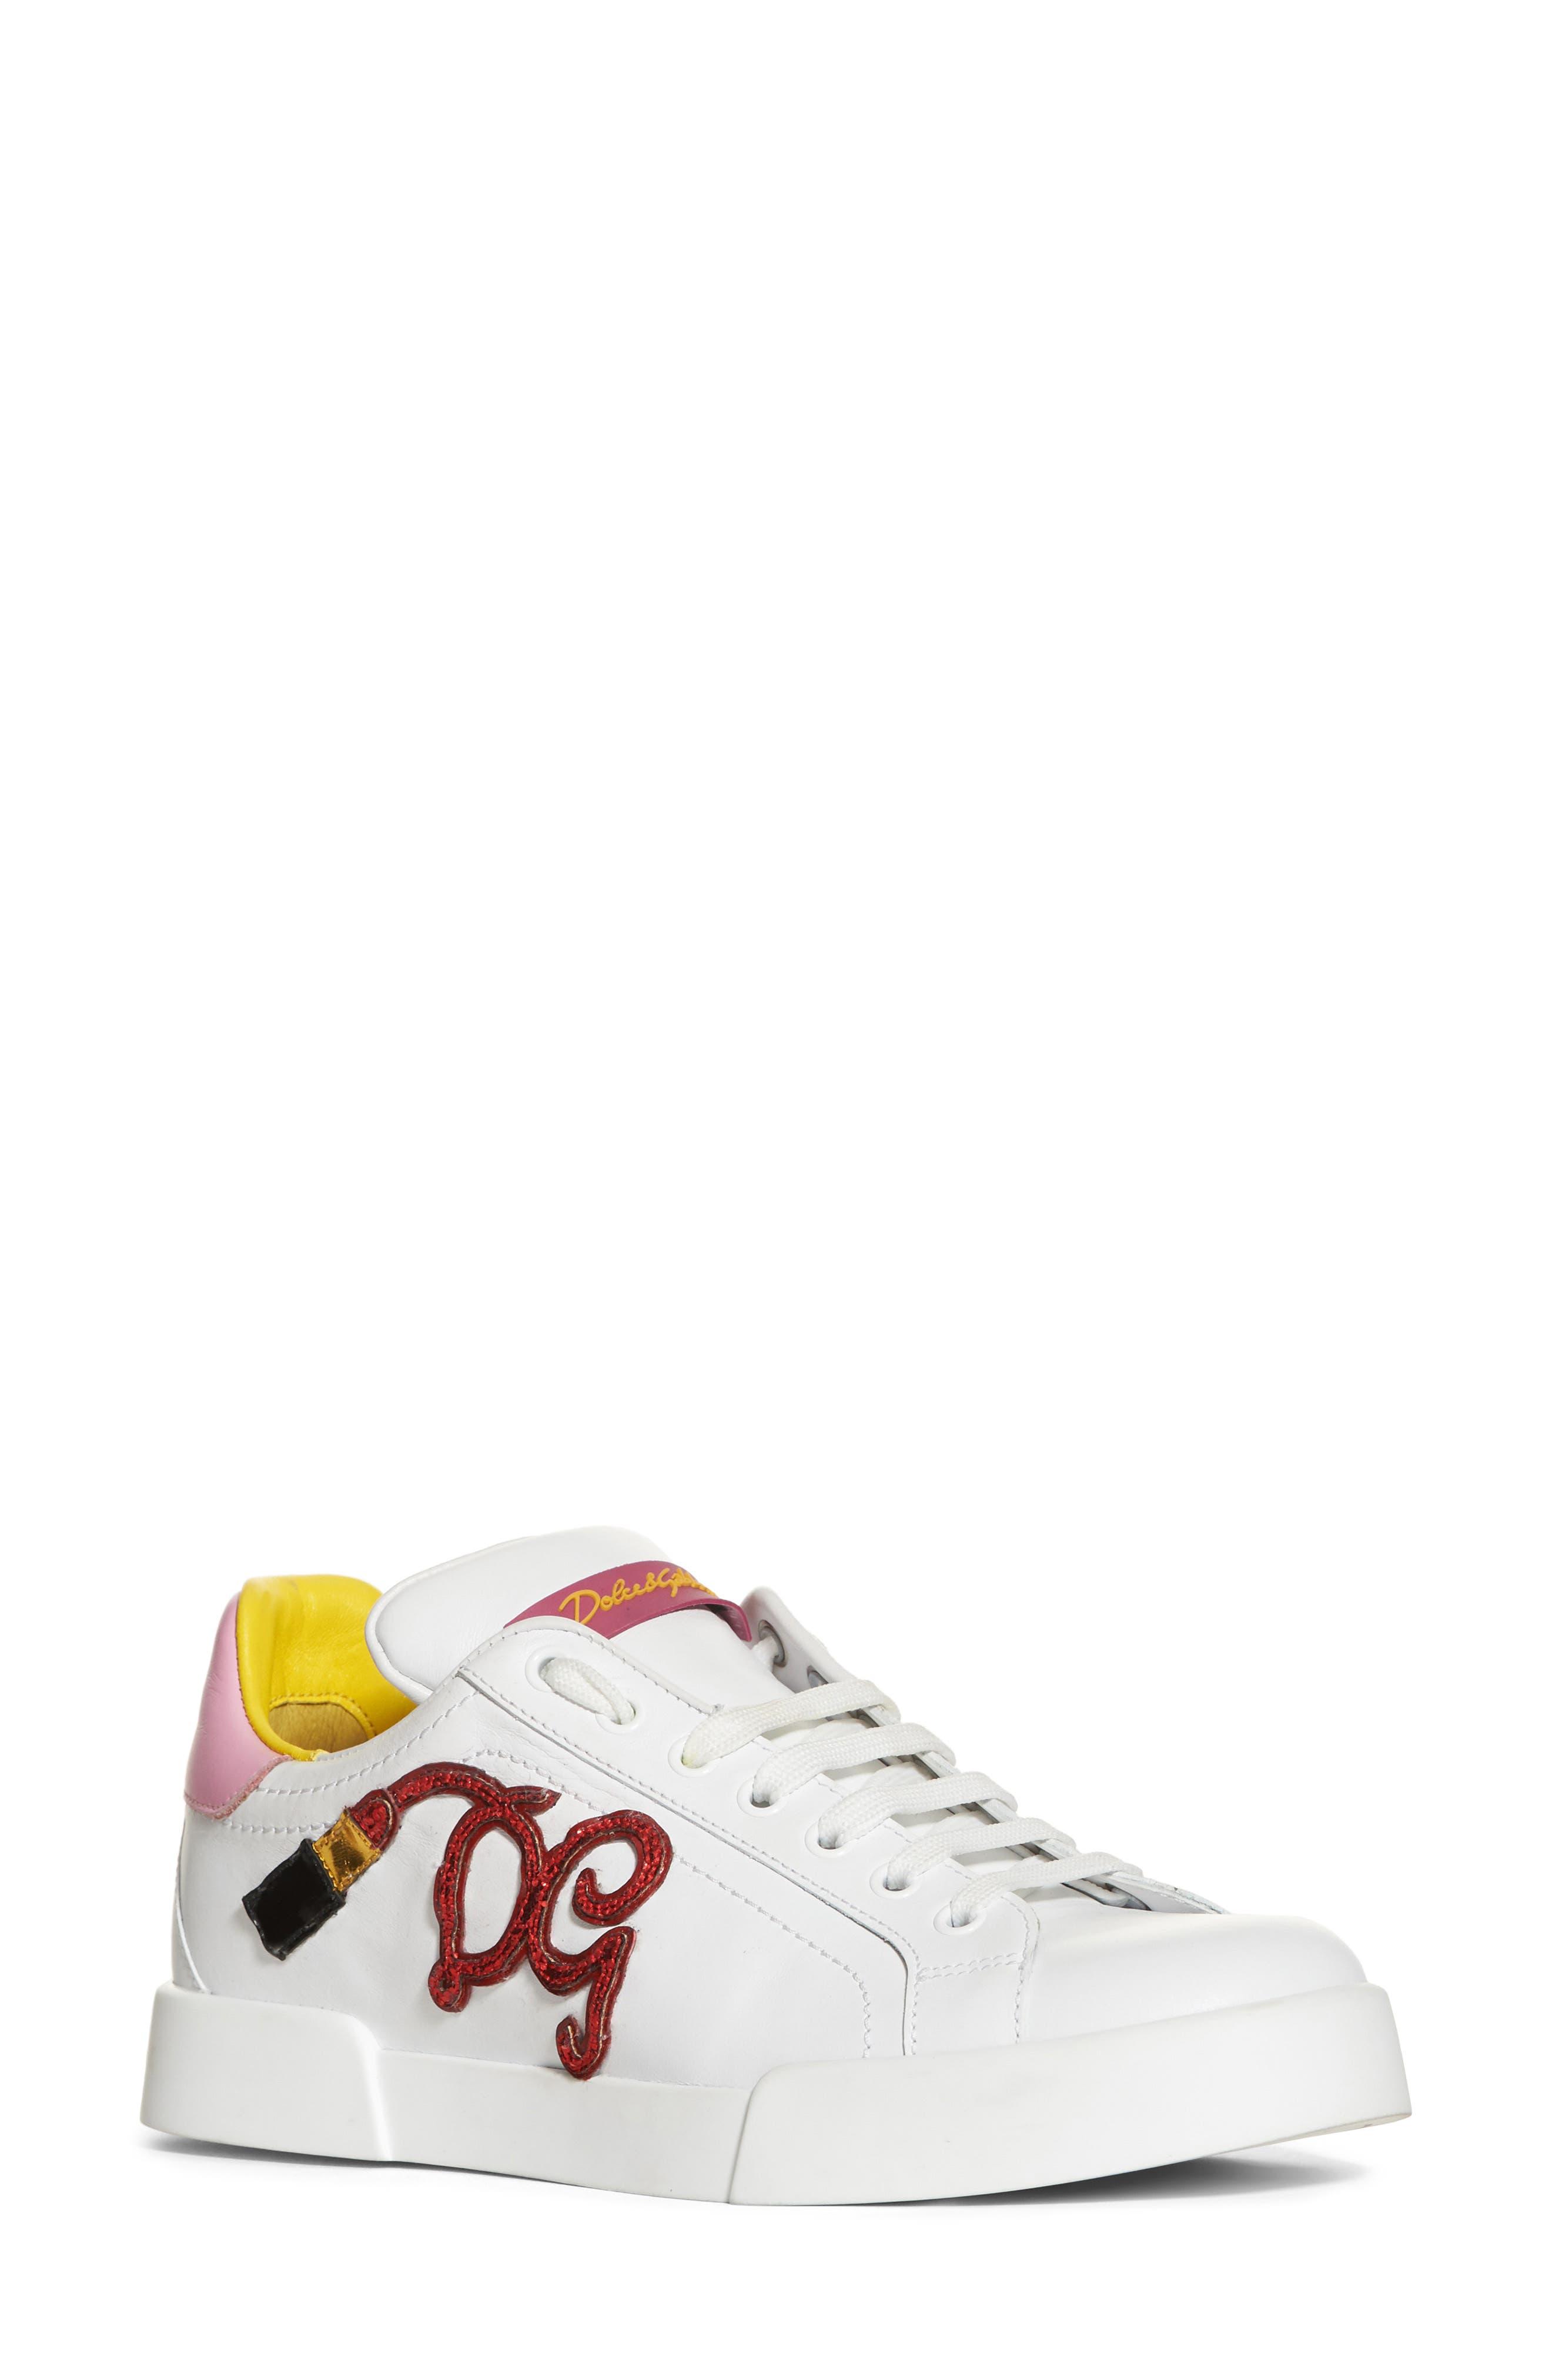 Alternate Image 1 Selected - Dolce&Gabbana Lipstick Sneaker (Women)